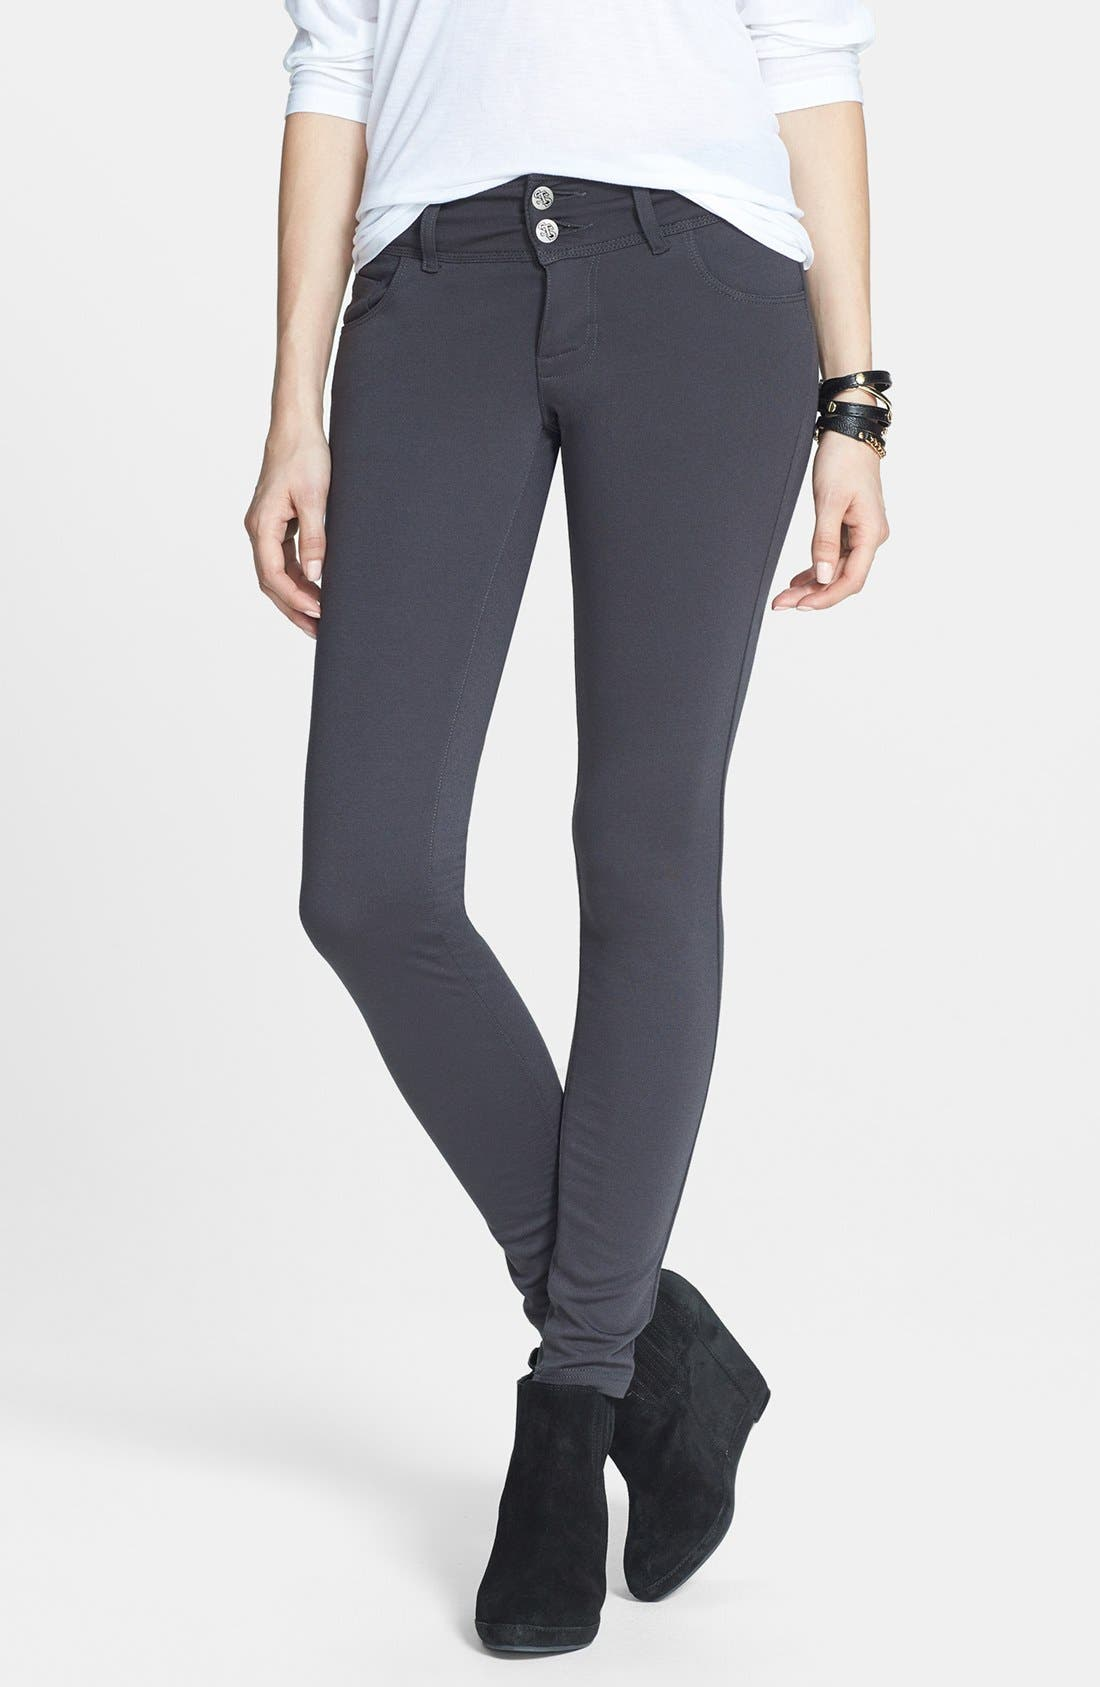 Alternate Image 1 Selected - STS Blue Skinny Ponte Pants (Juniors)